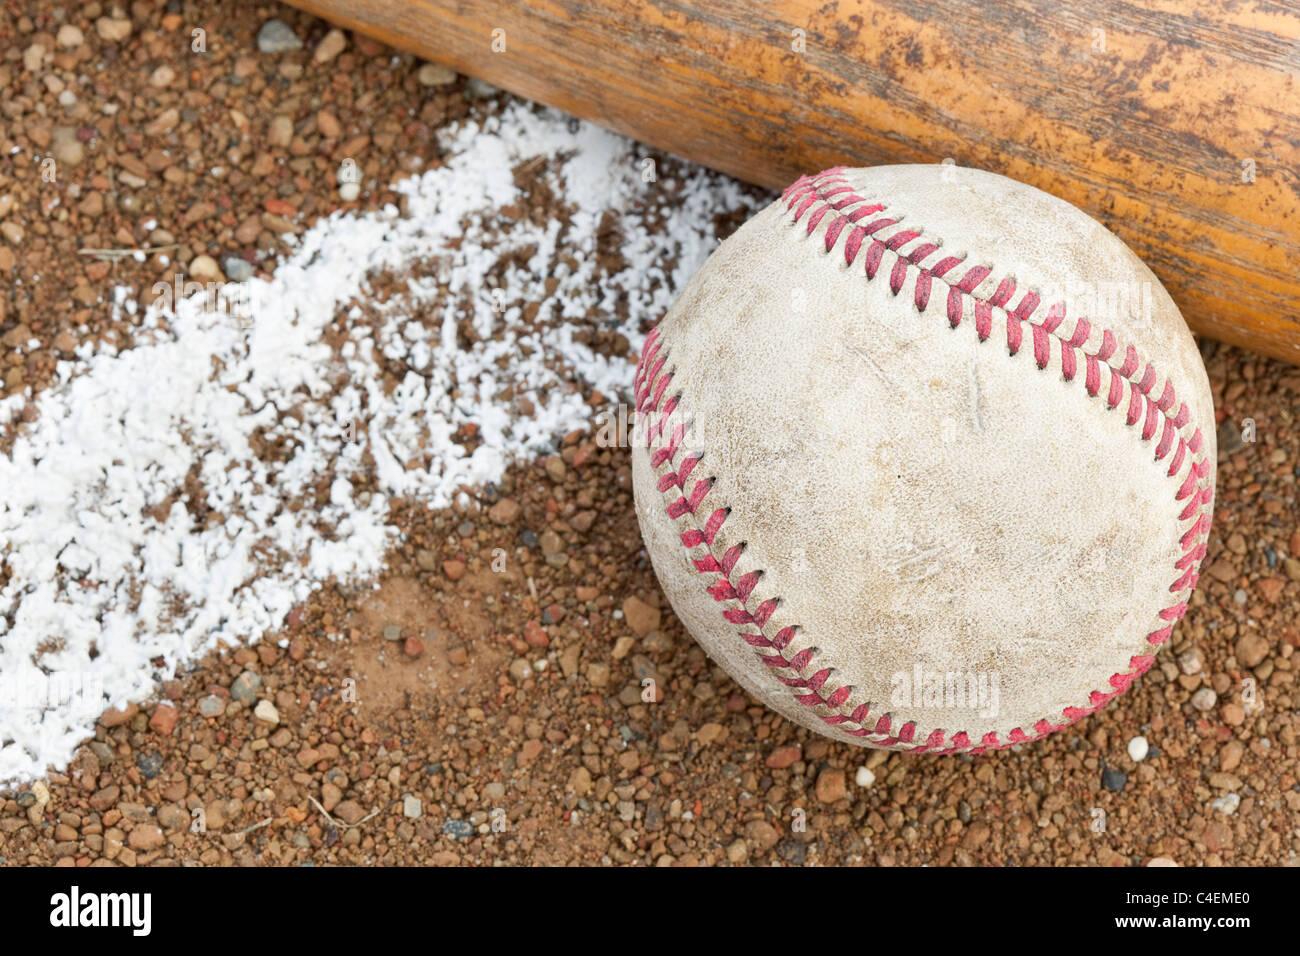 An old worn baseball and bat on a baseball field - Stock Image